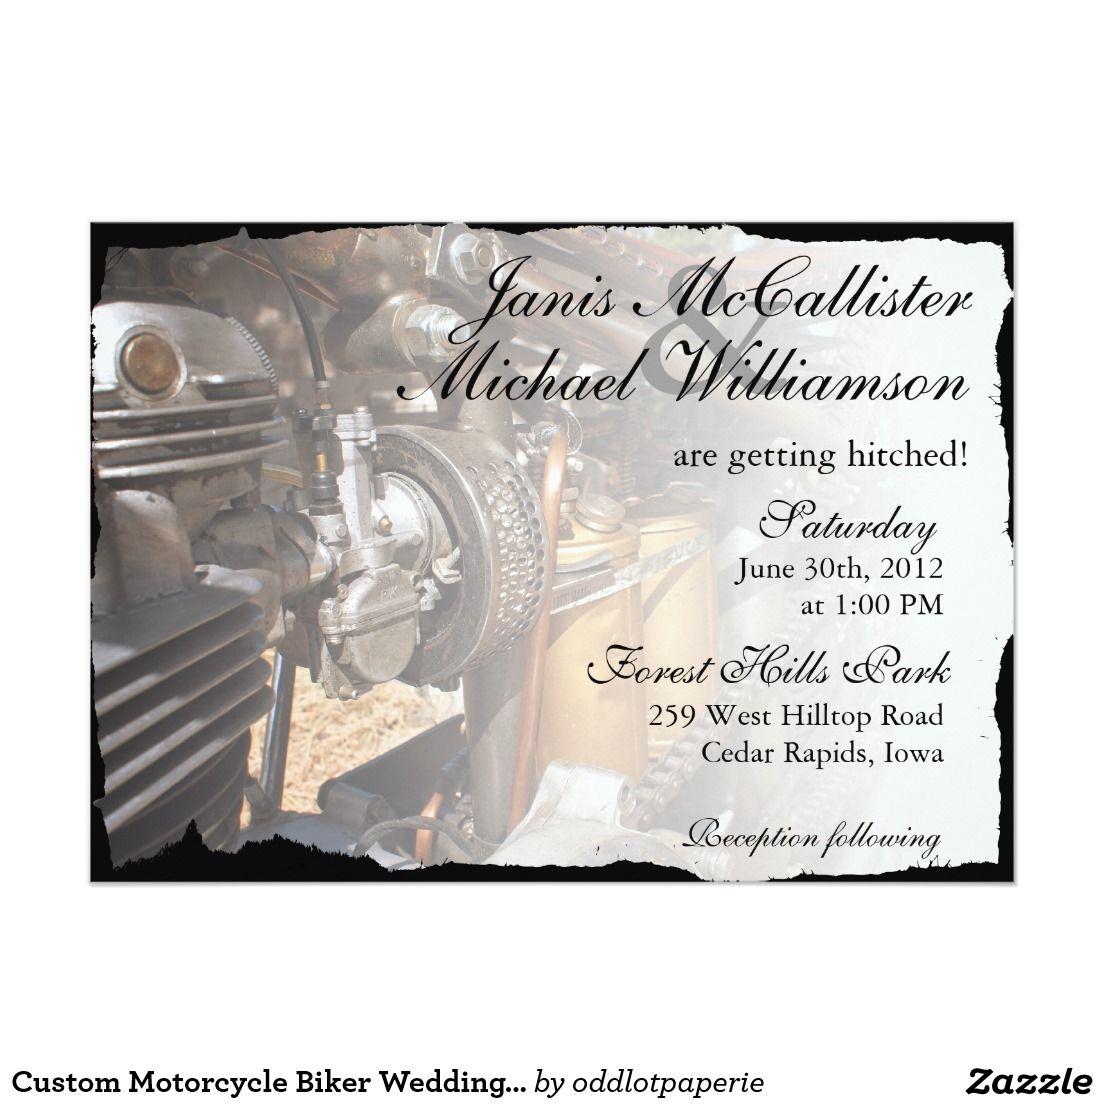 Custom Motorcycle Biker Wedding Invitation   Wedding   Pinterest ...